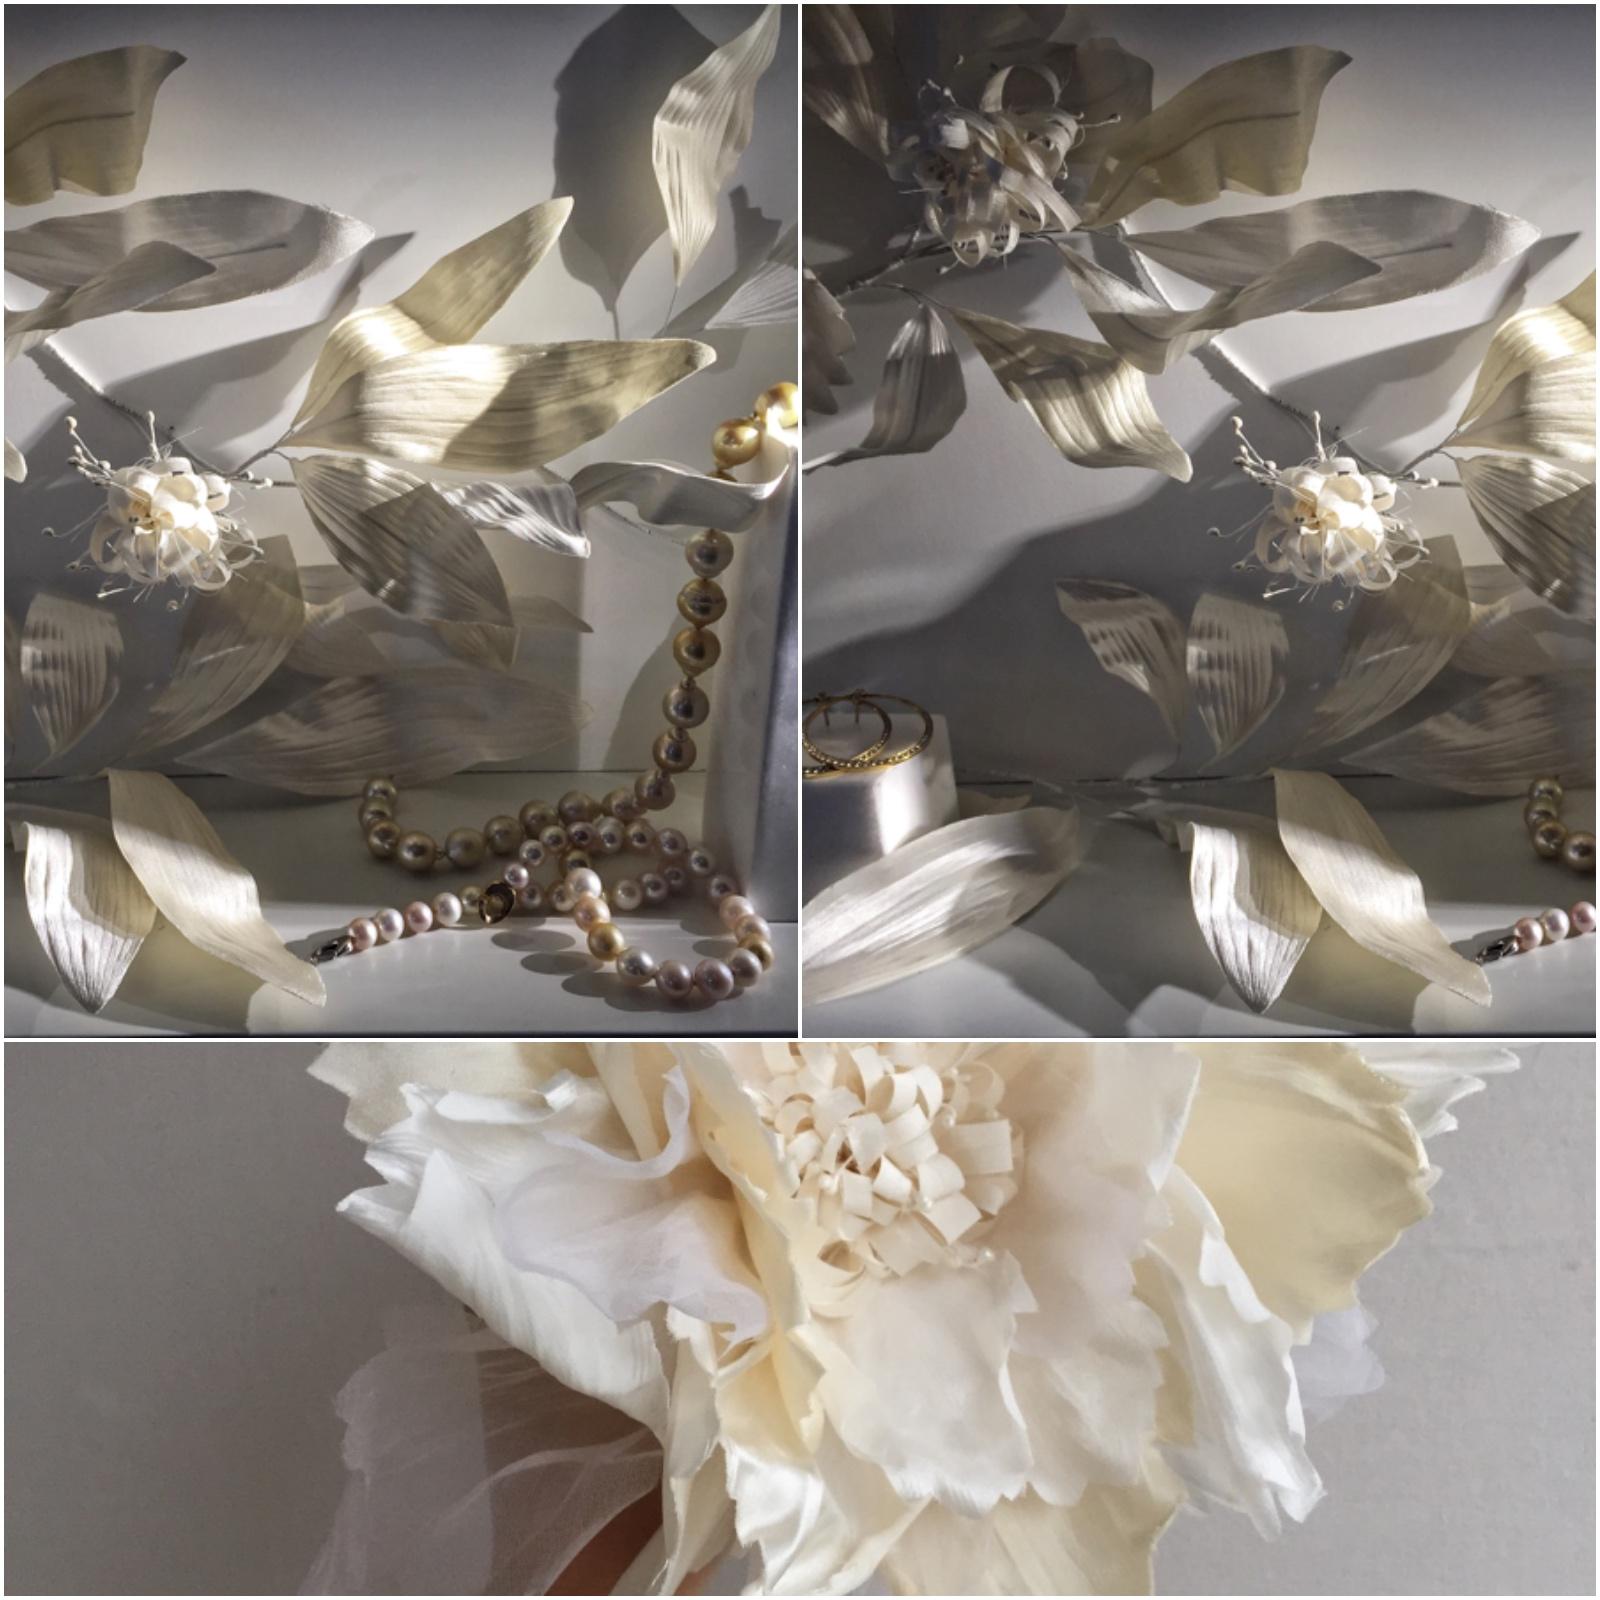 BodilBinner-Jewellery-EffiPingel-04